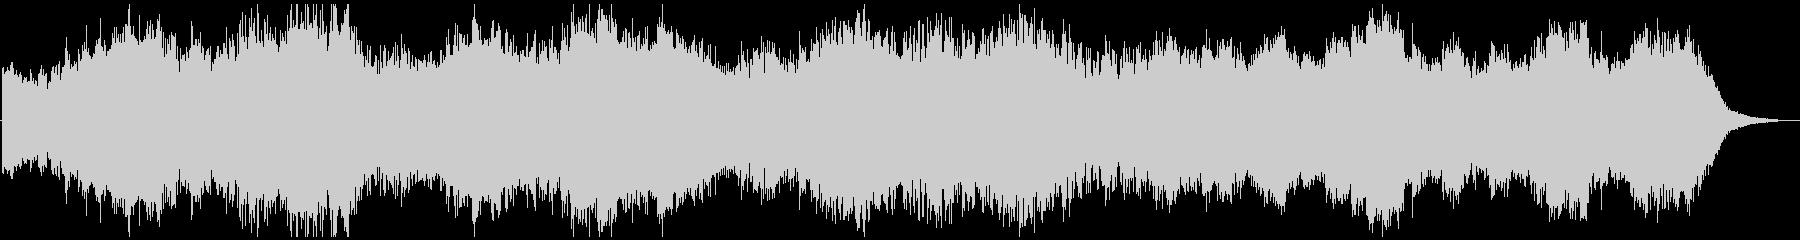 PADS 不安定なベース02の未再生の波形